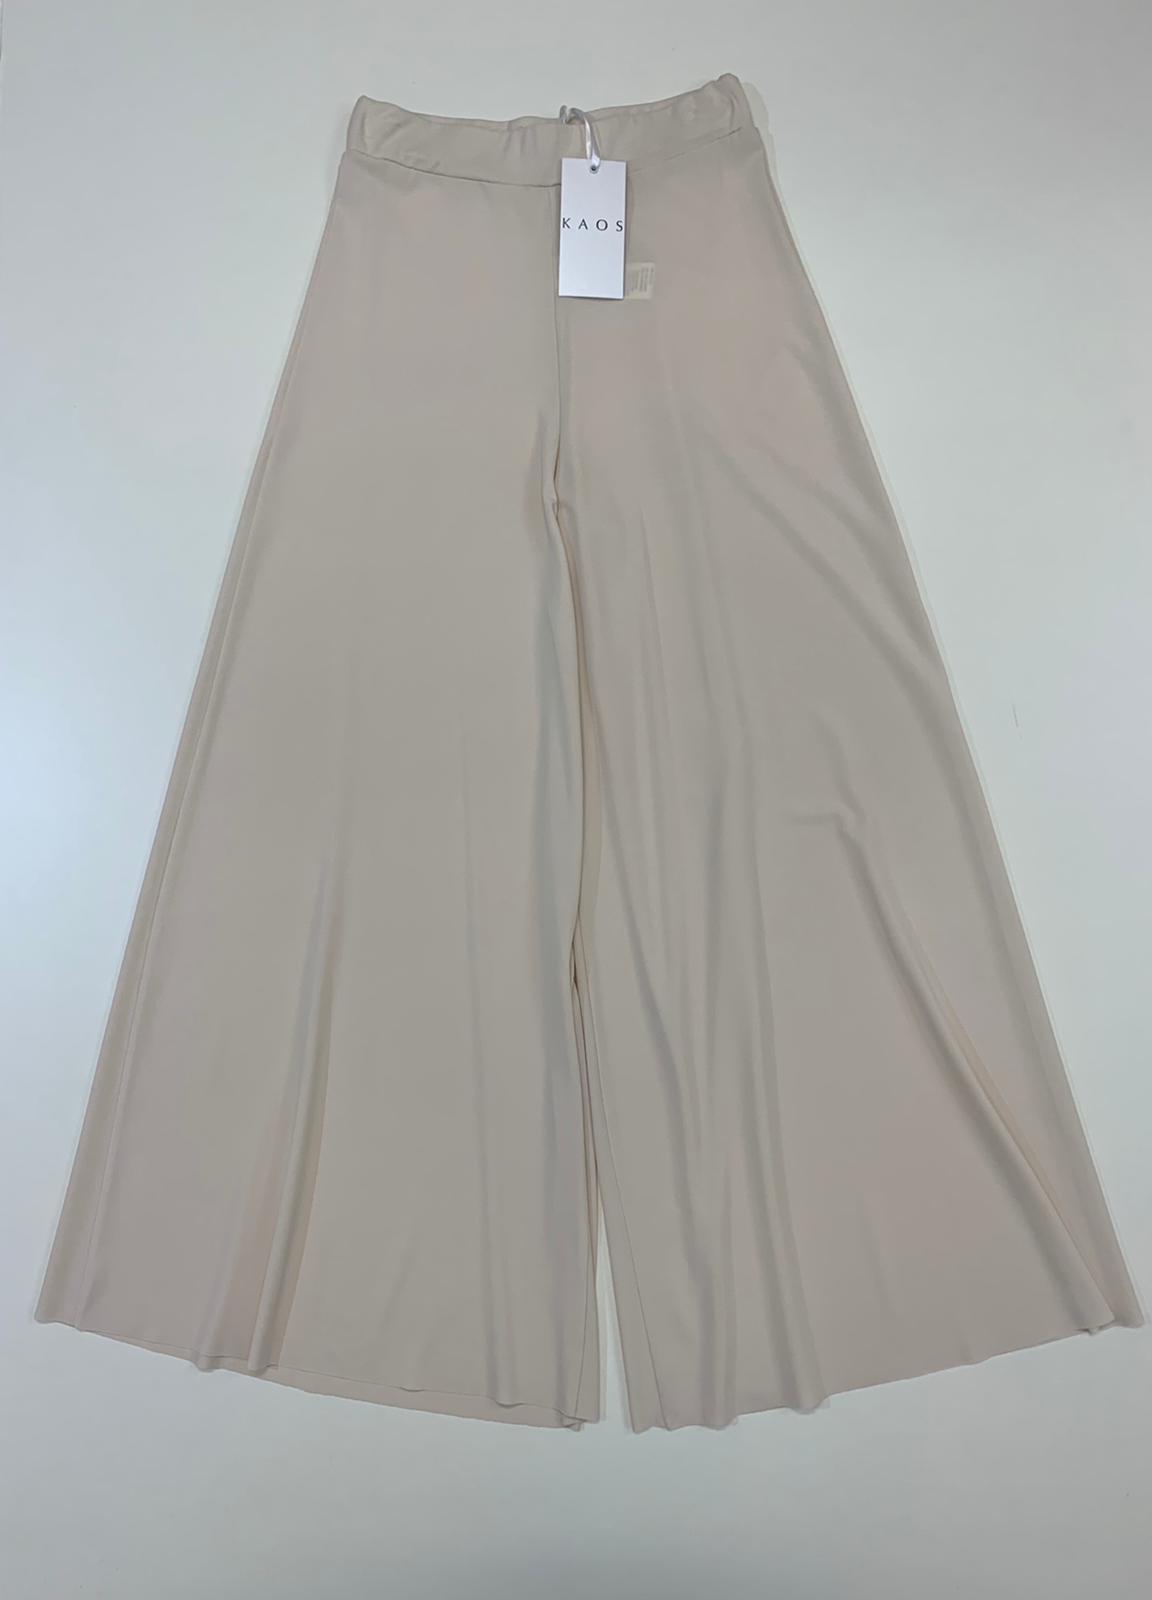 Pantalone Donna Kaos Collection Pantapalazzo Vaniglia